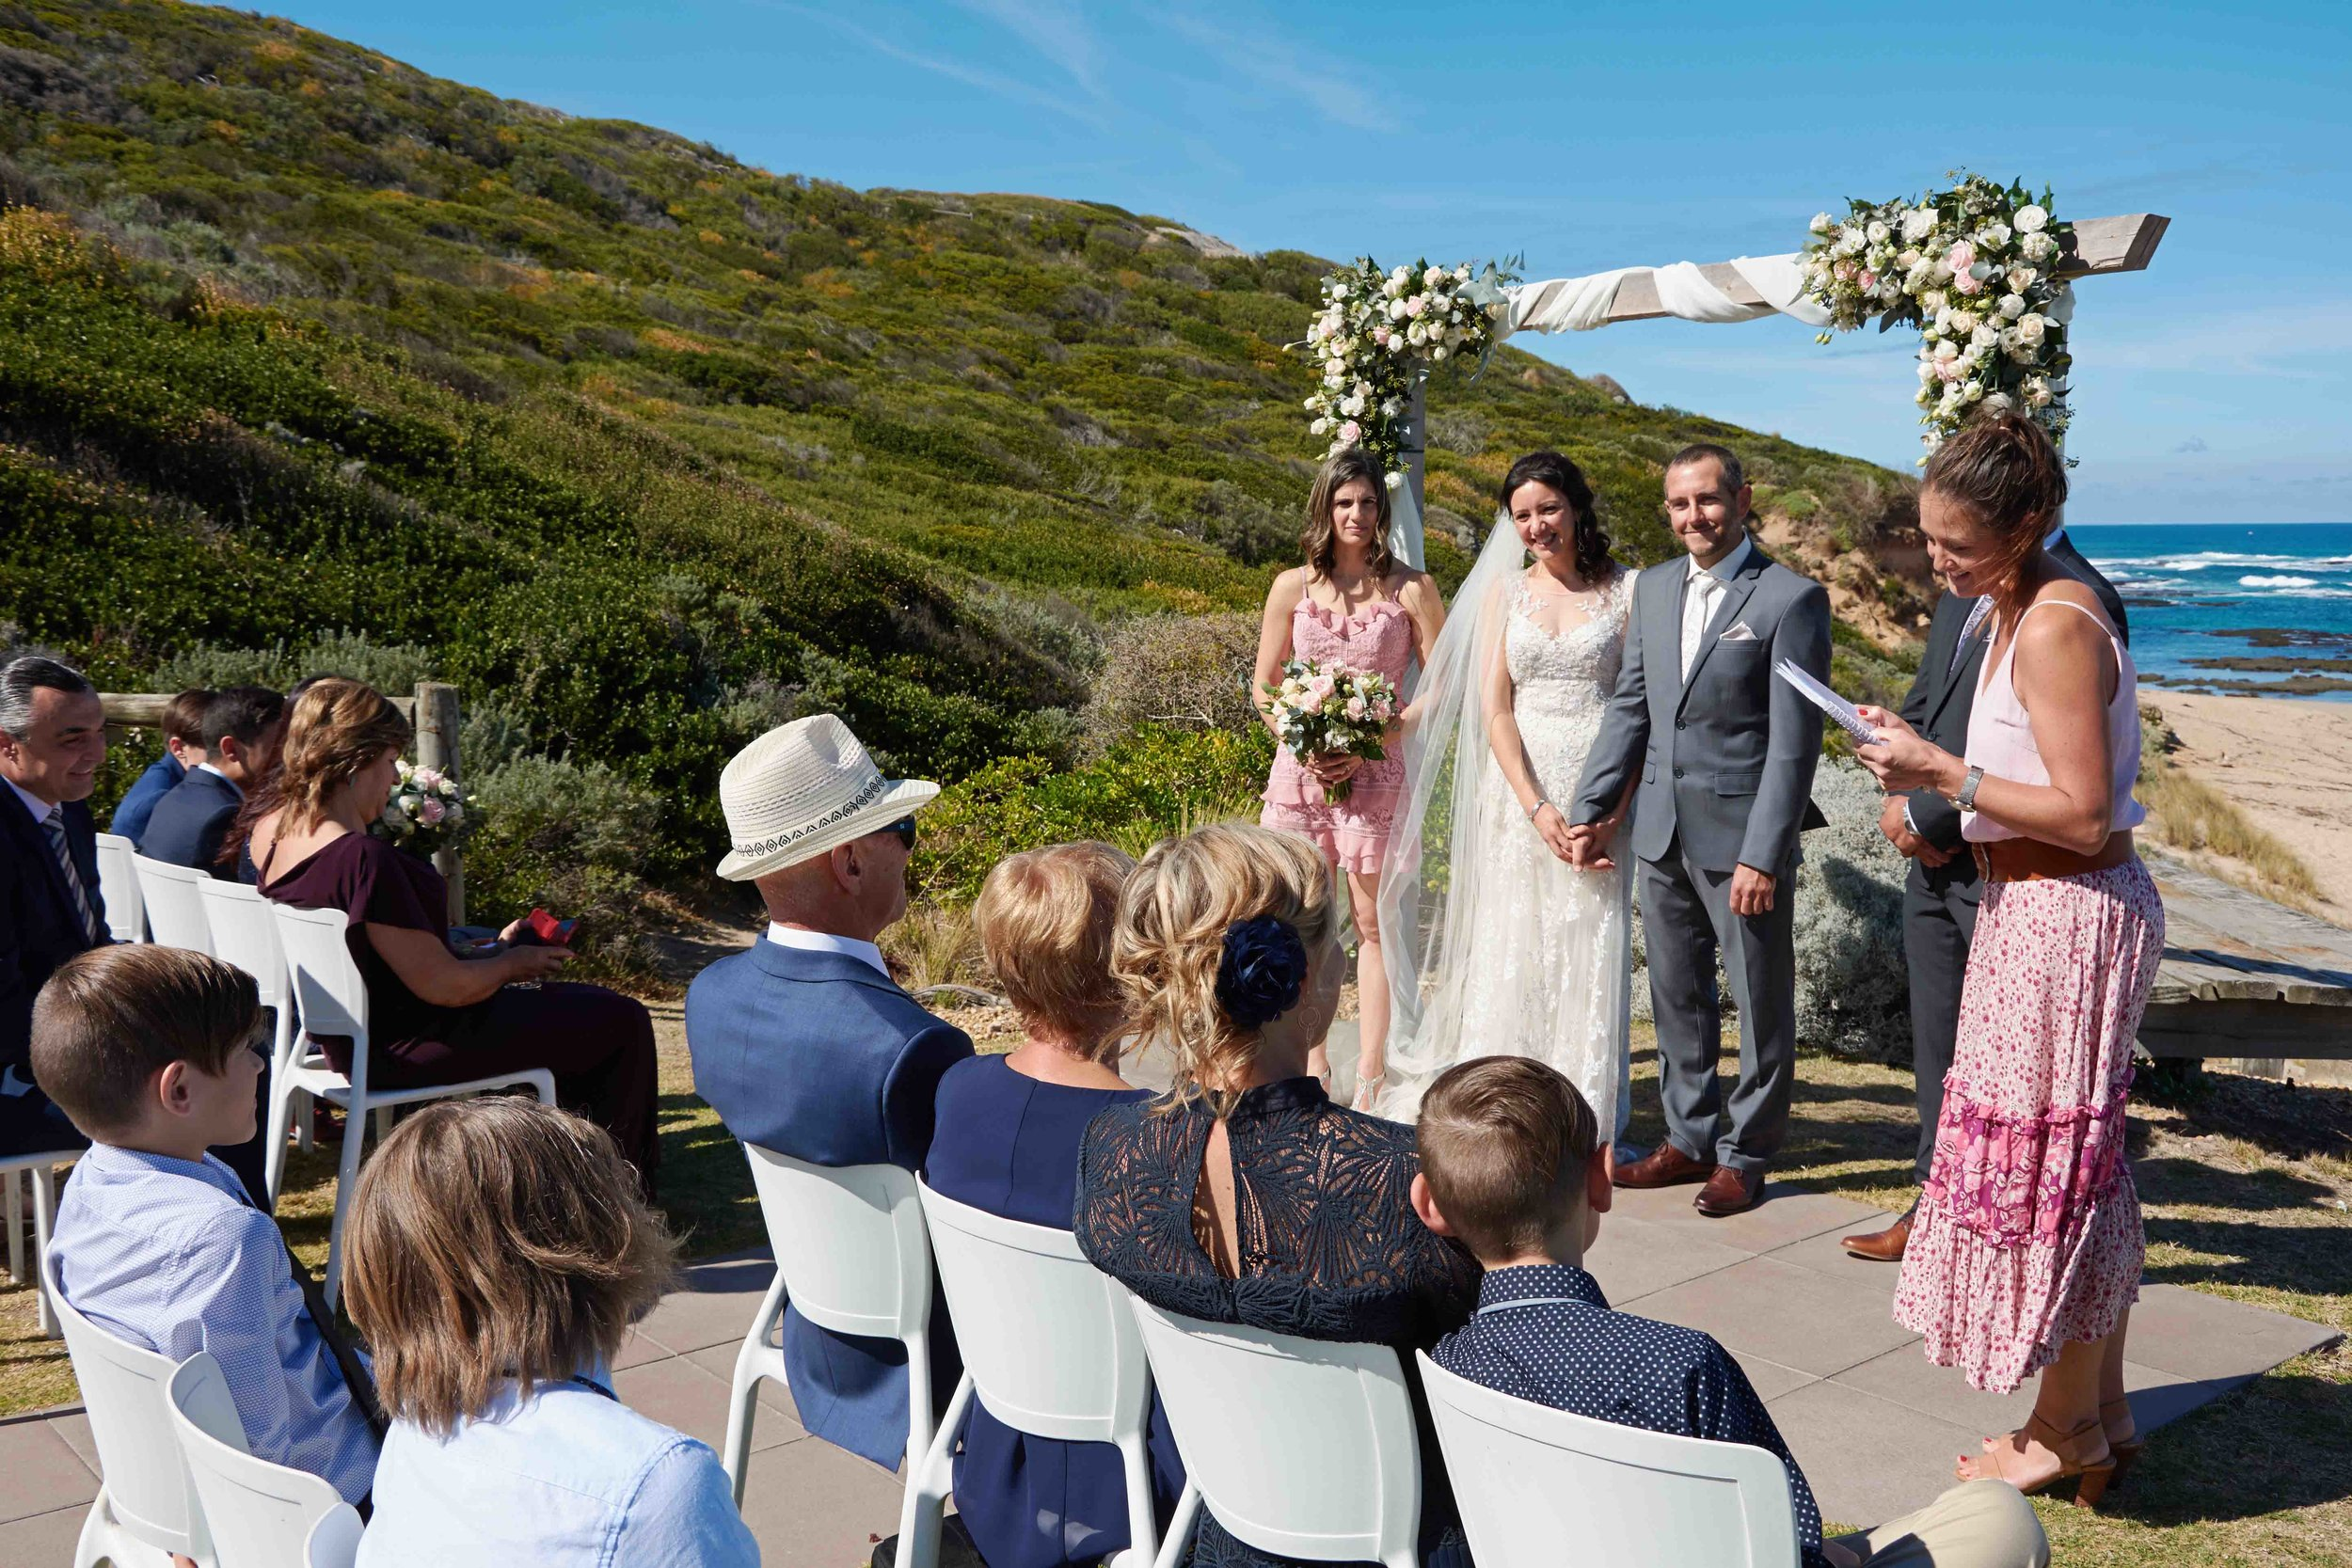 sorrento-wedding-photography-all-smiles-marissa-jade-photography-49.jpg